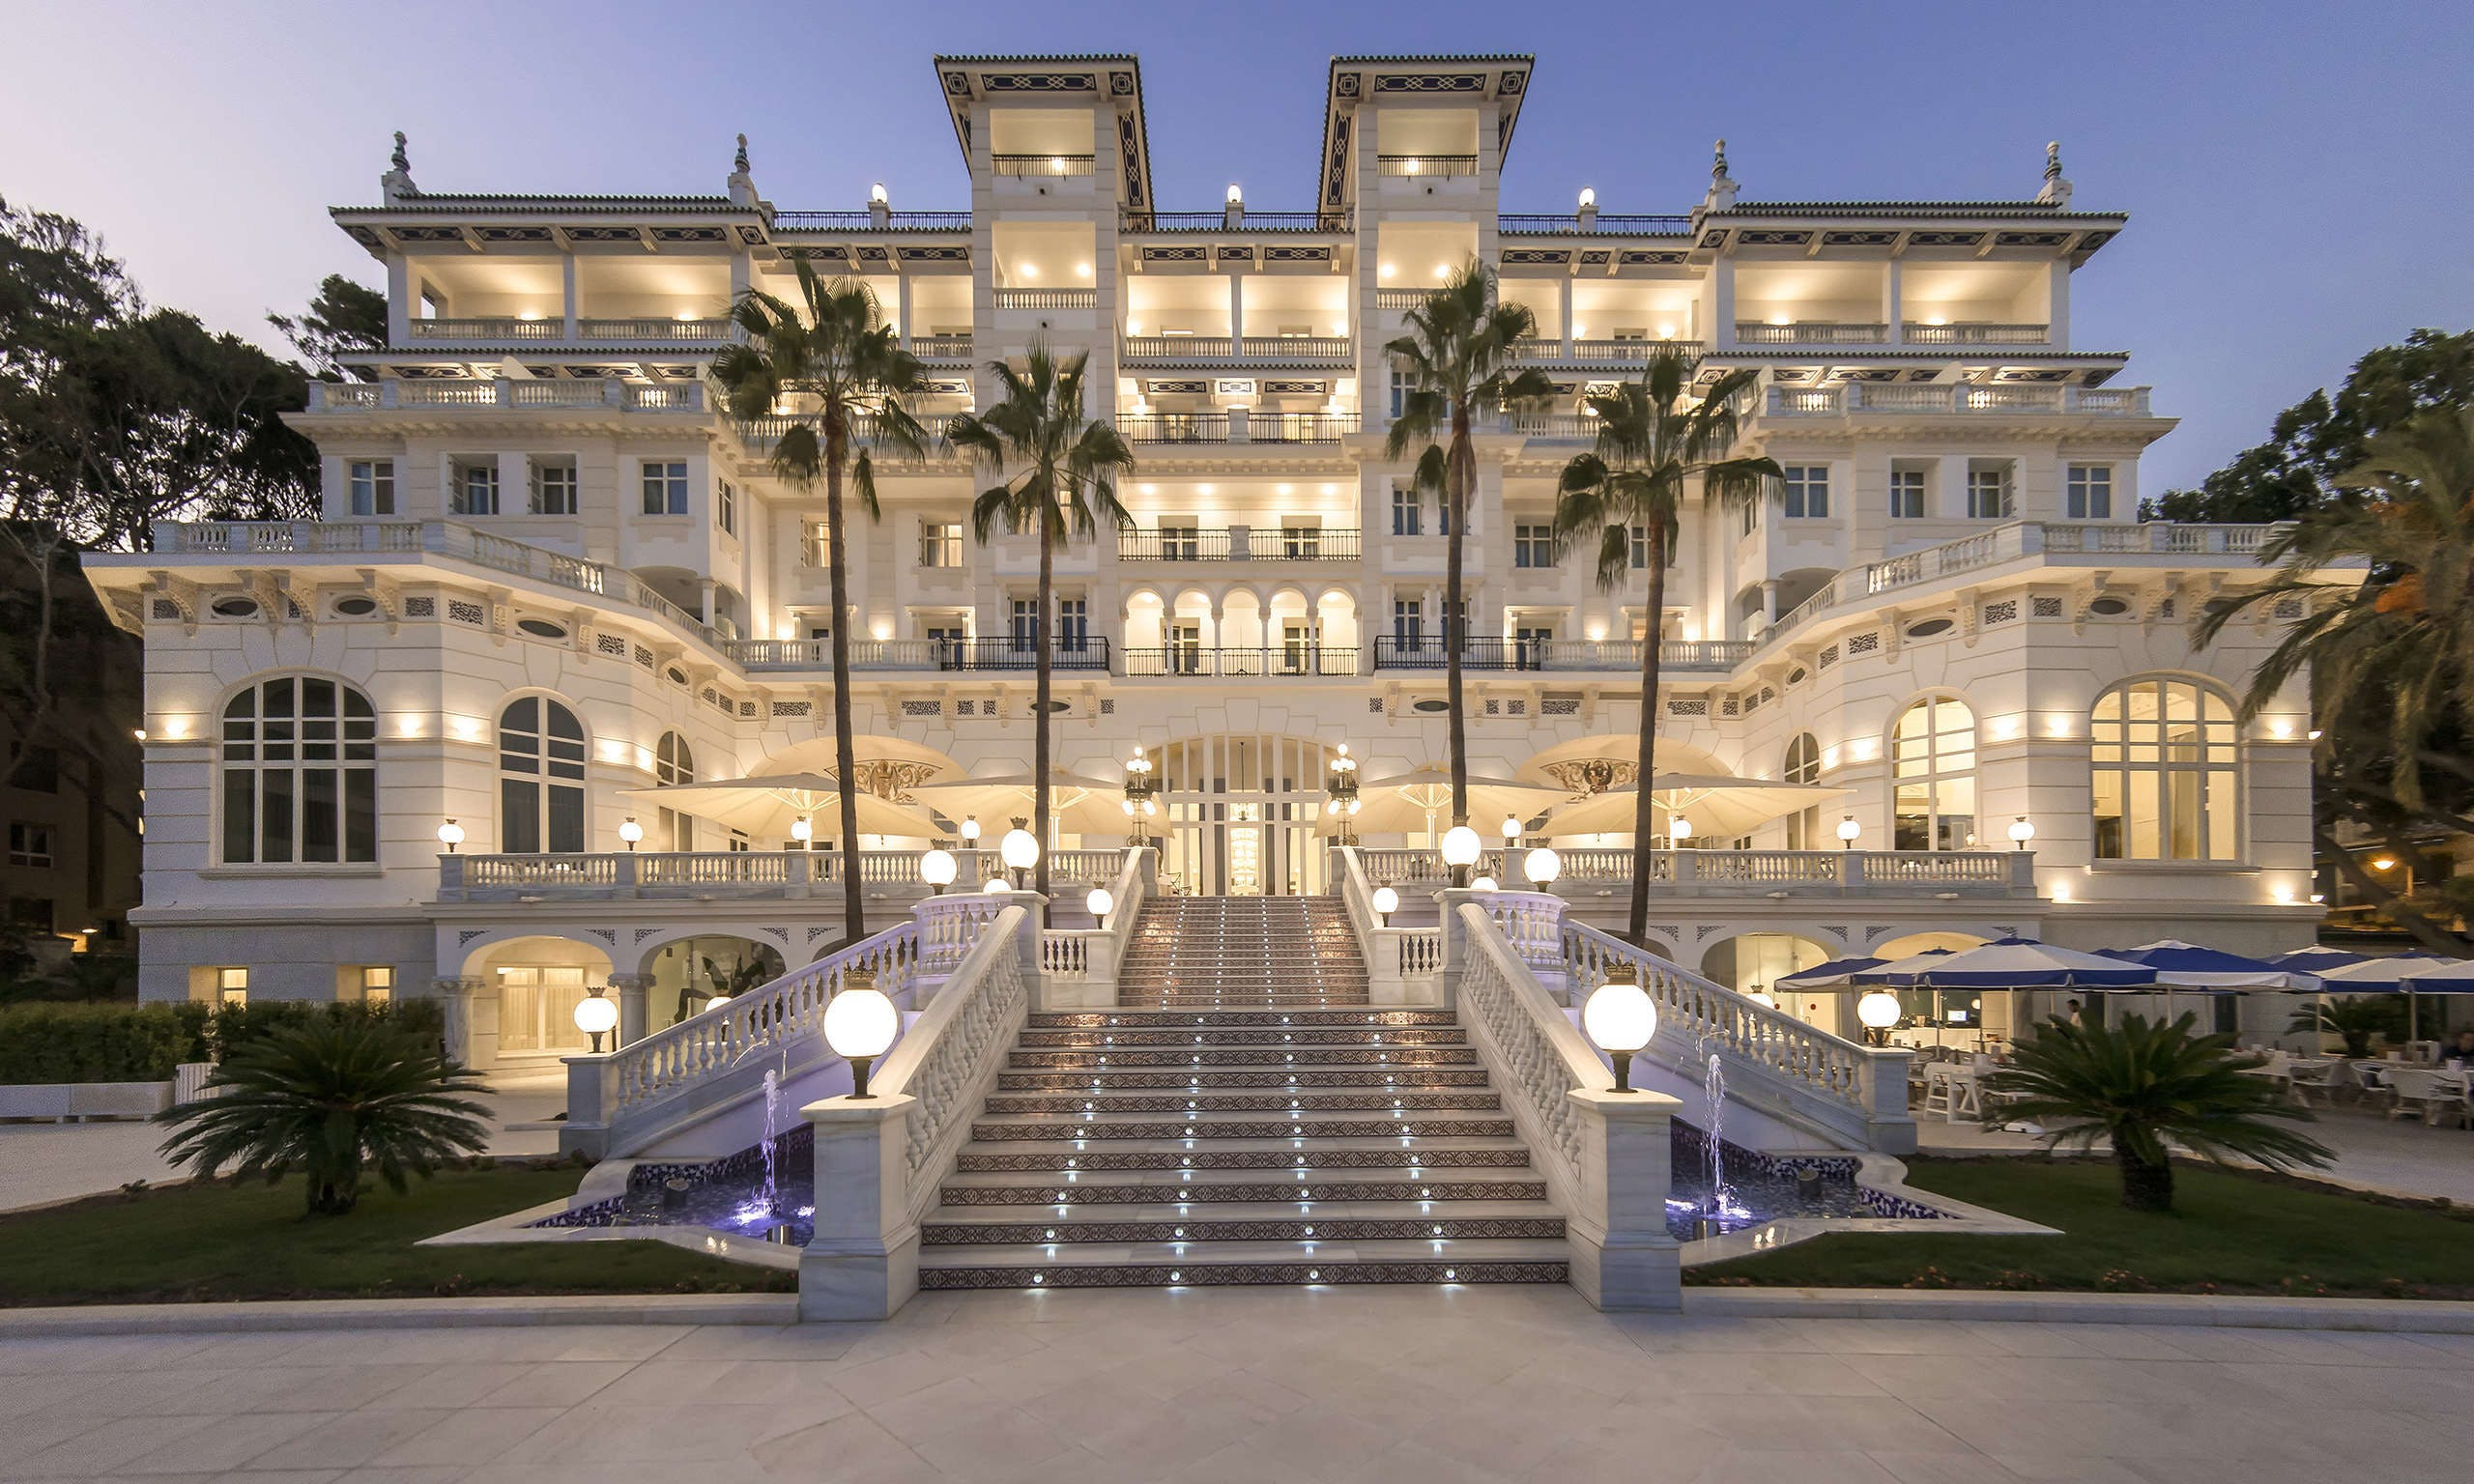 Gran Hotel Malaga